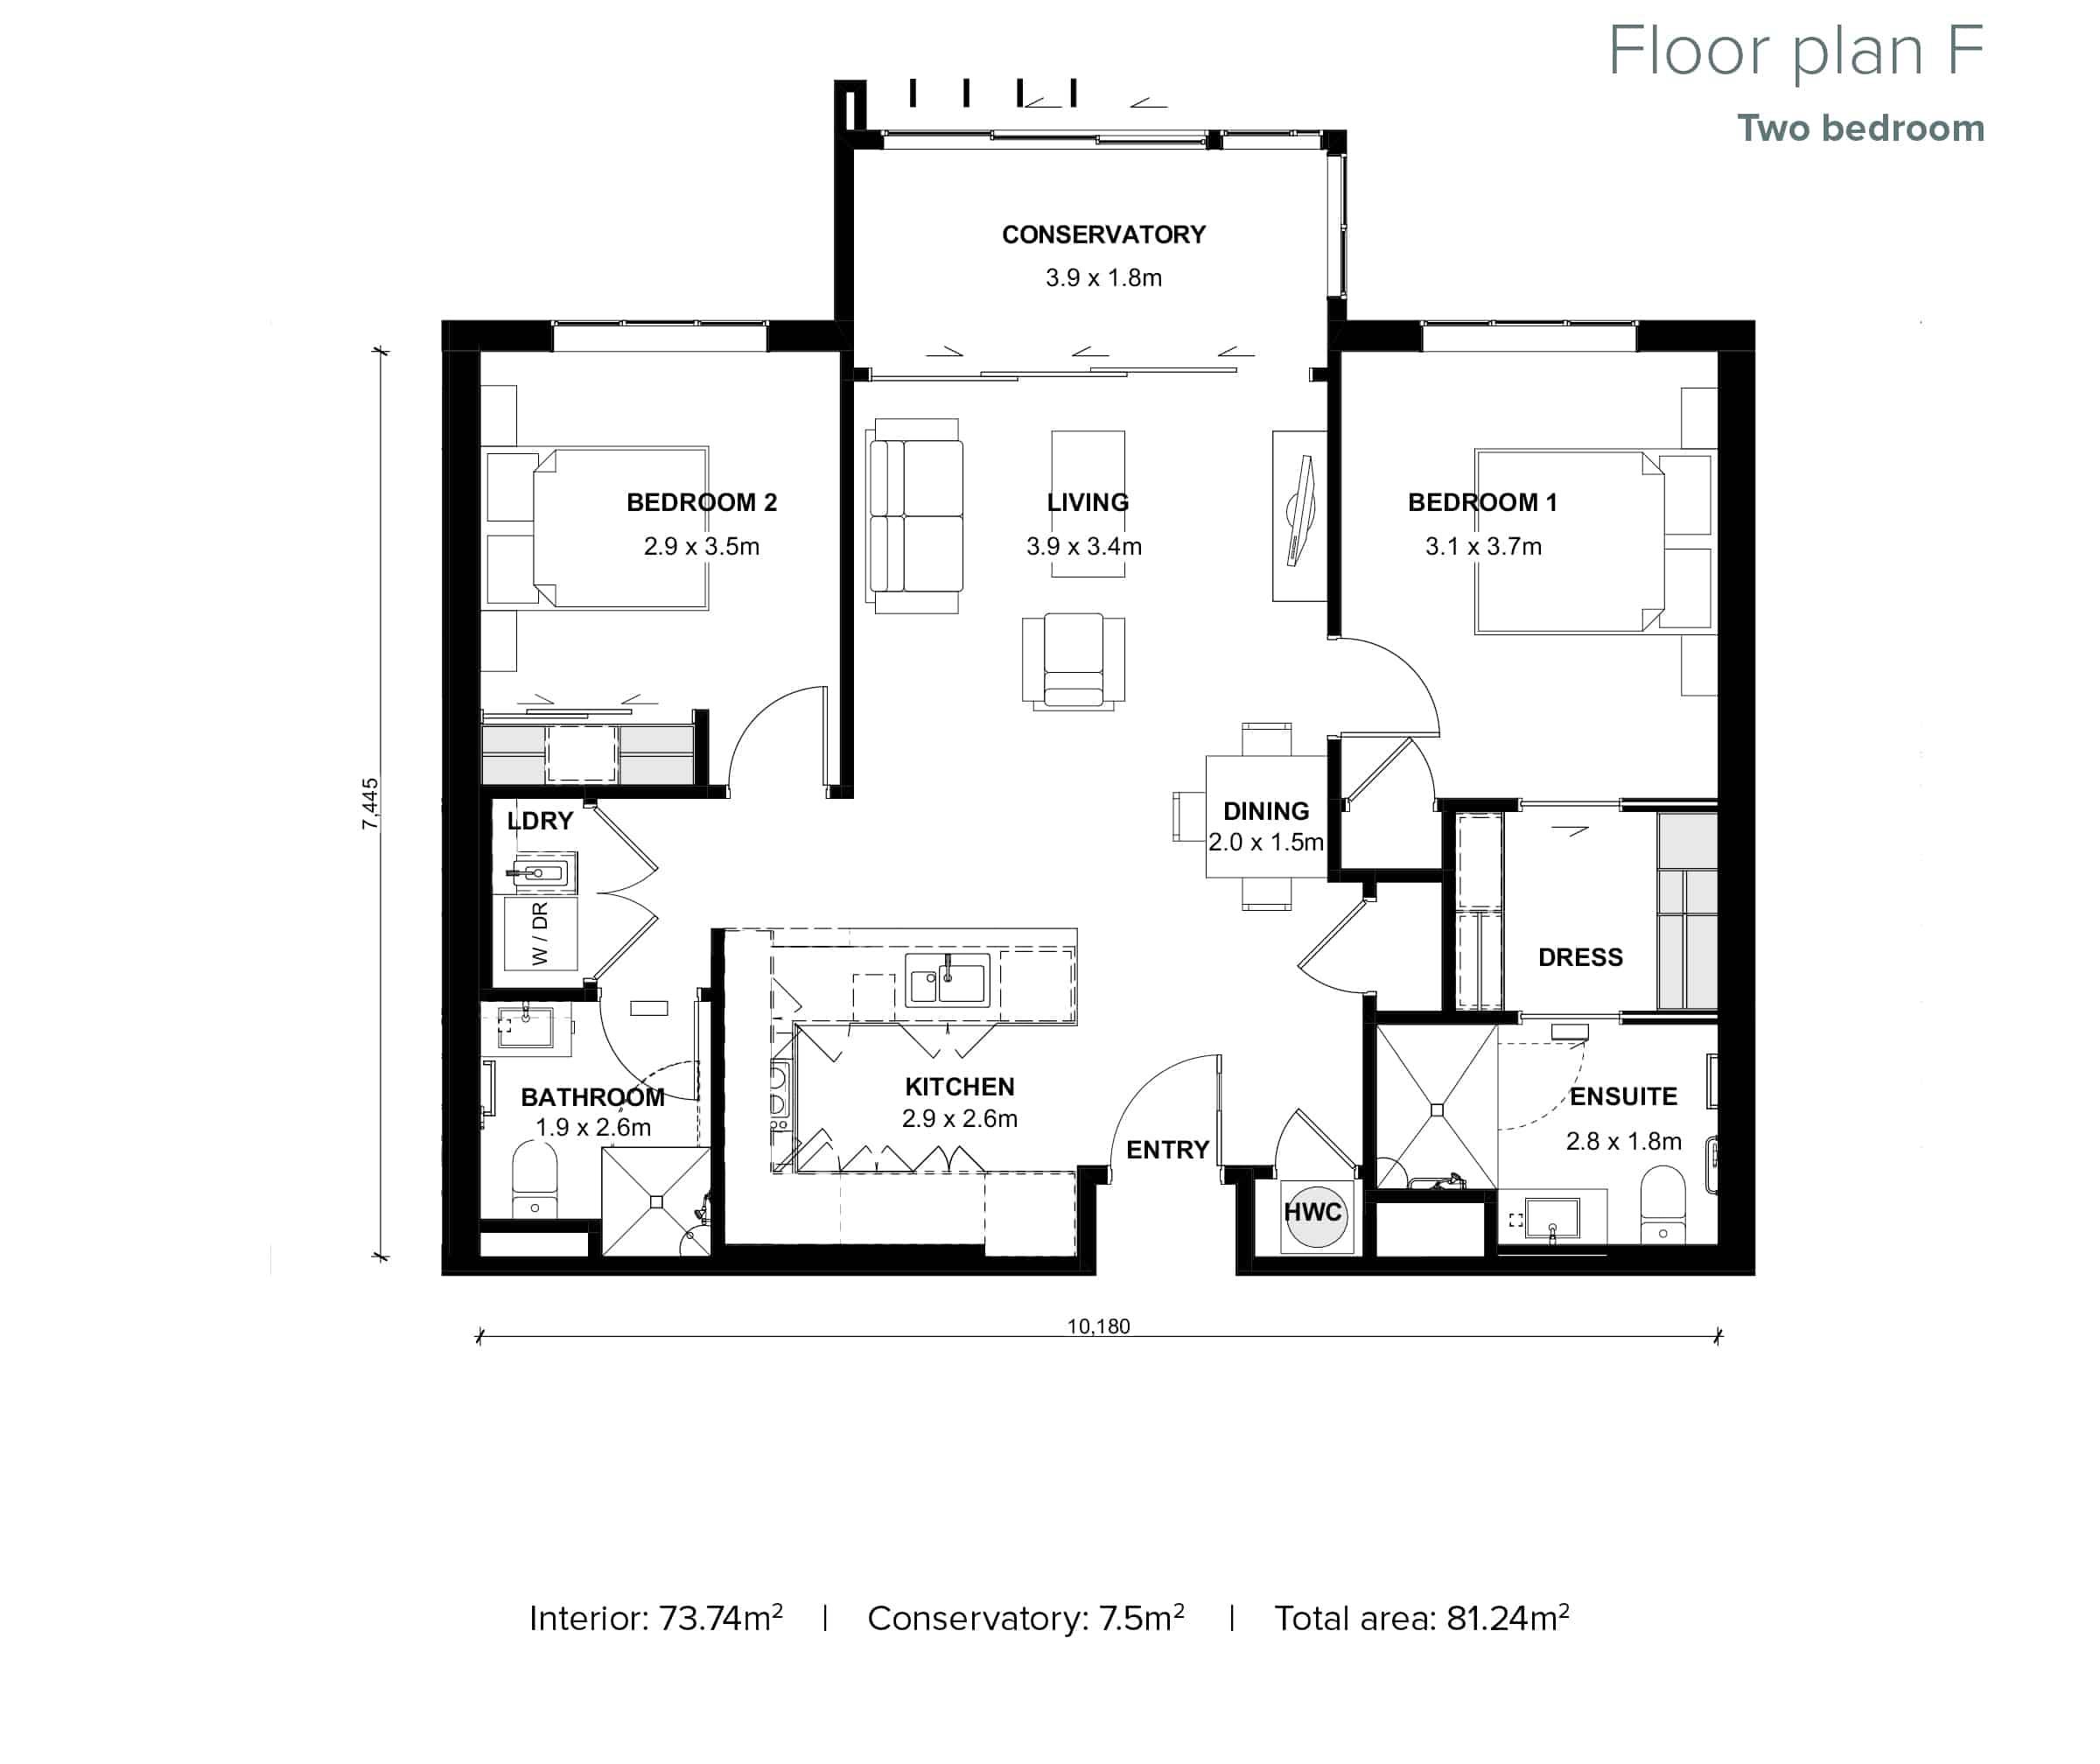 The Grove Orewa - Floor plan F - Two Bedroom